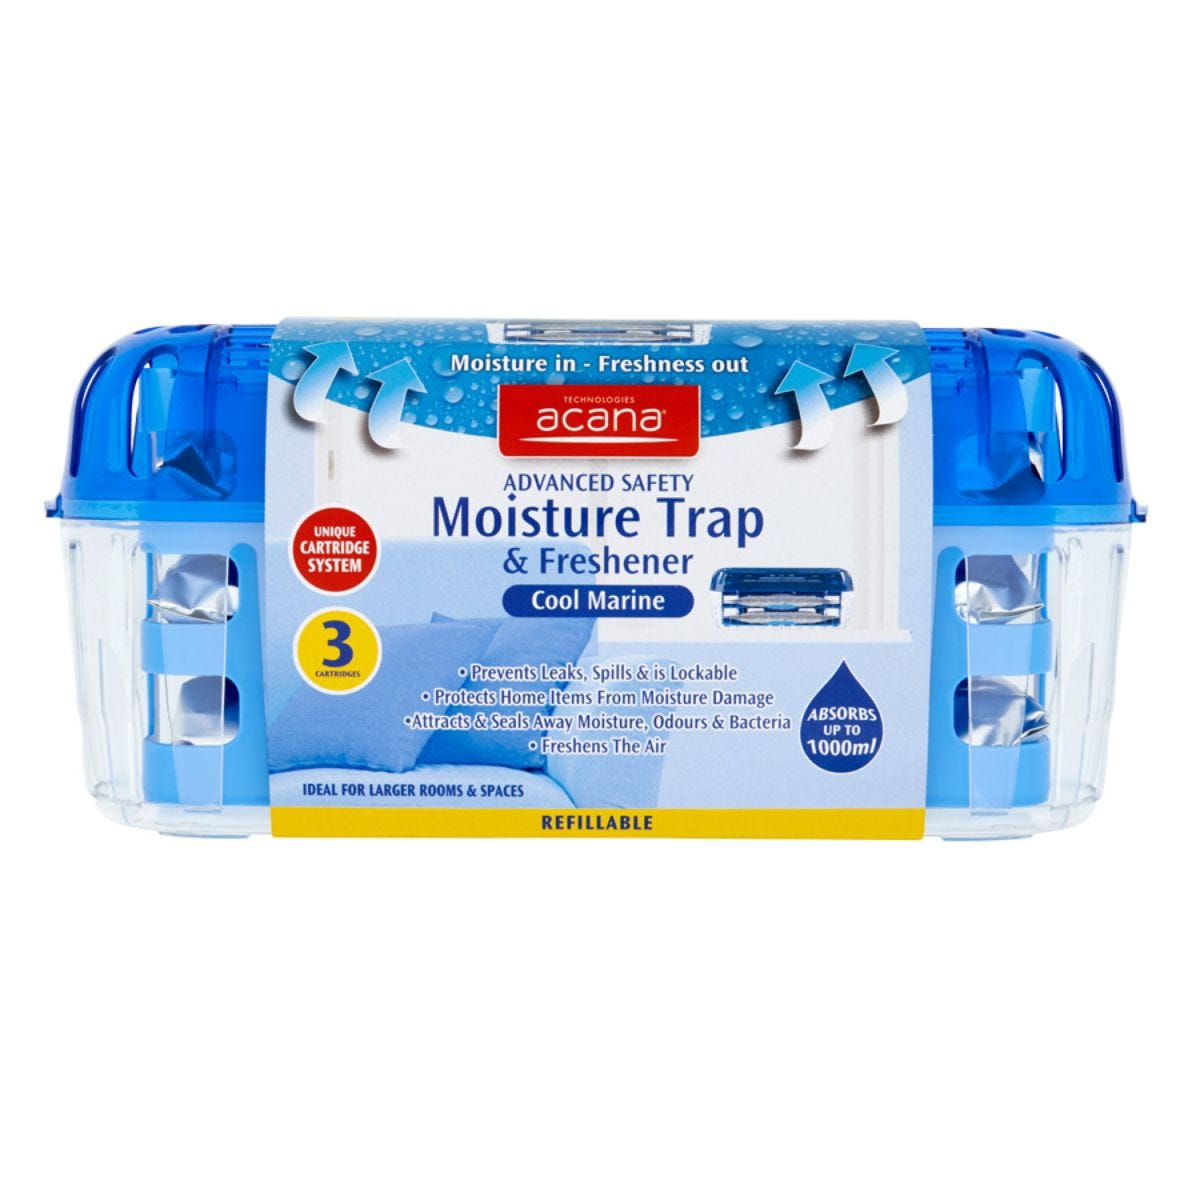 Acana Advanced Moisture Trap